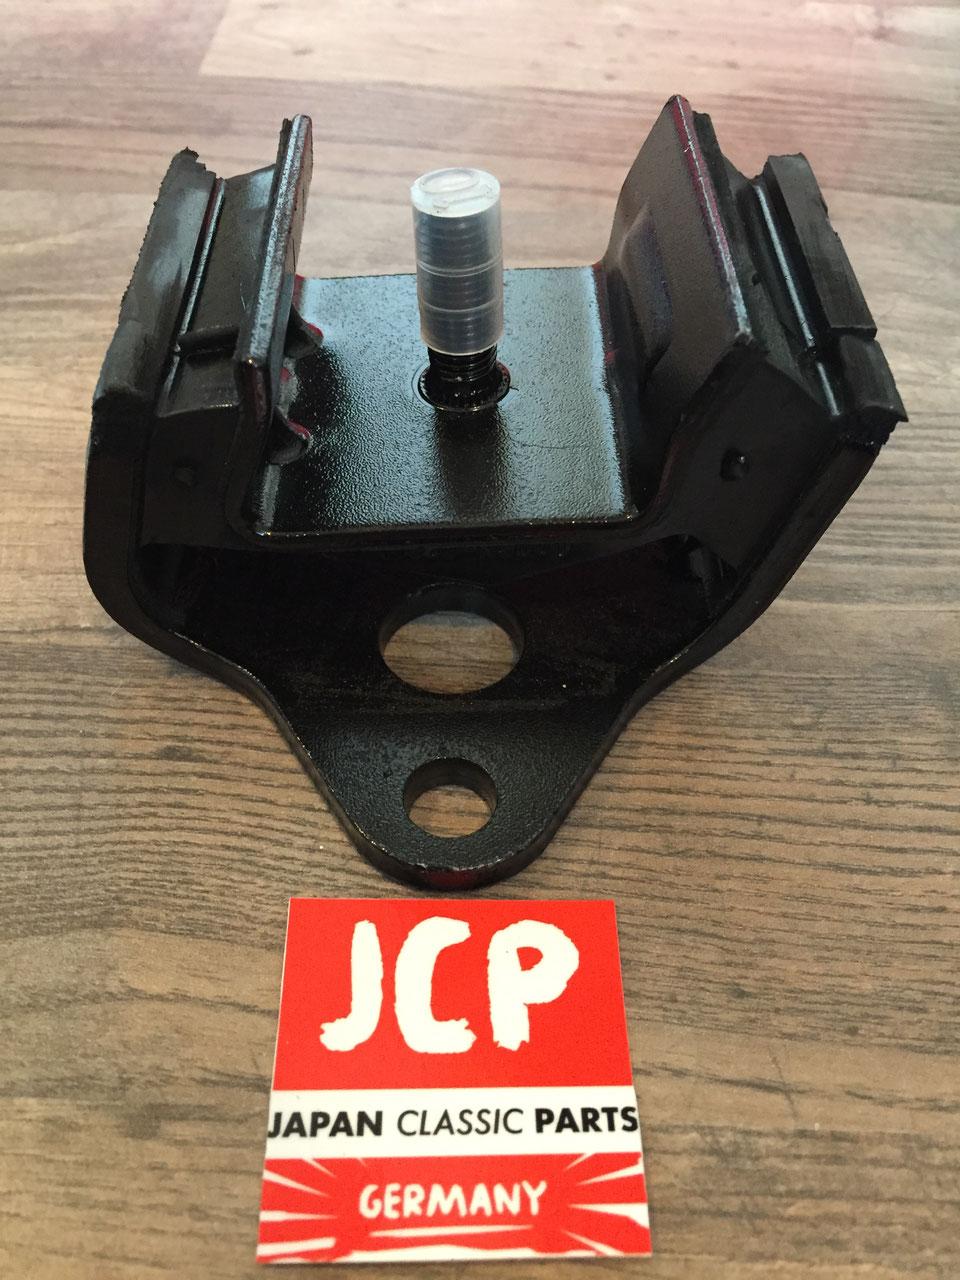 Auto & Motorrad: Teile Auto-Tuning & -Styling sainchargny.com ...